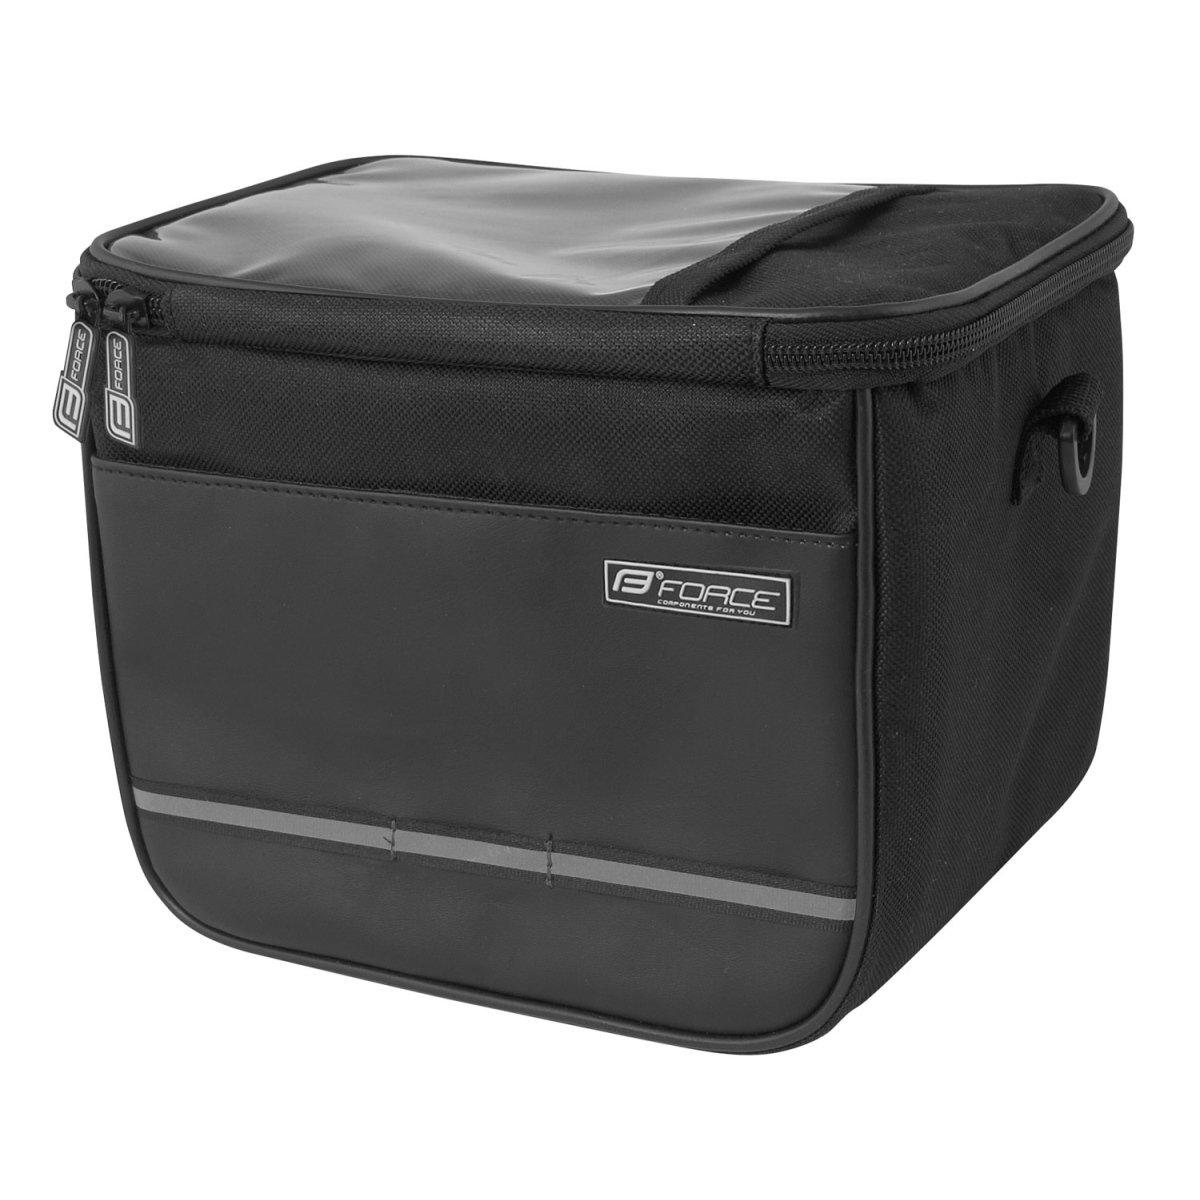 Force Cube styrtaske sort - 169,00 | Handlebar bags